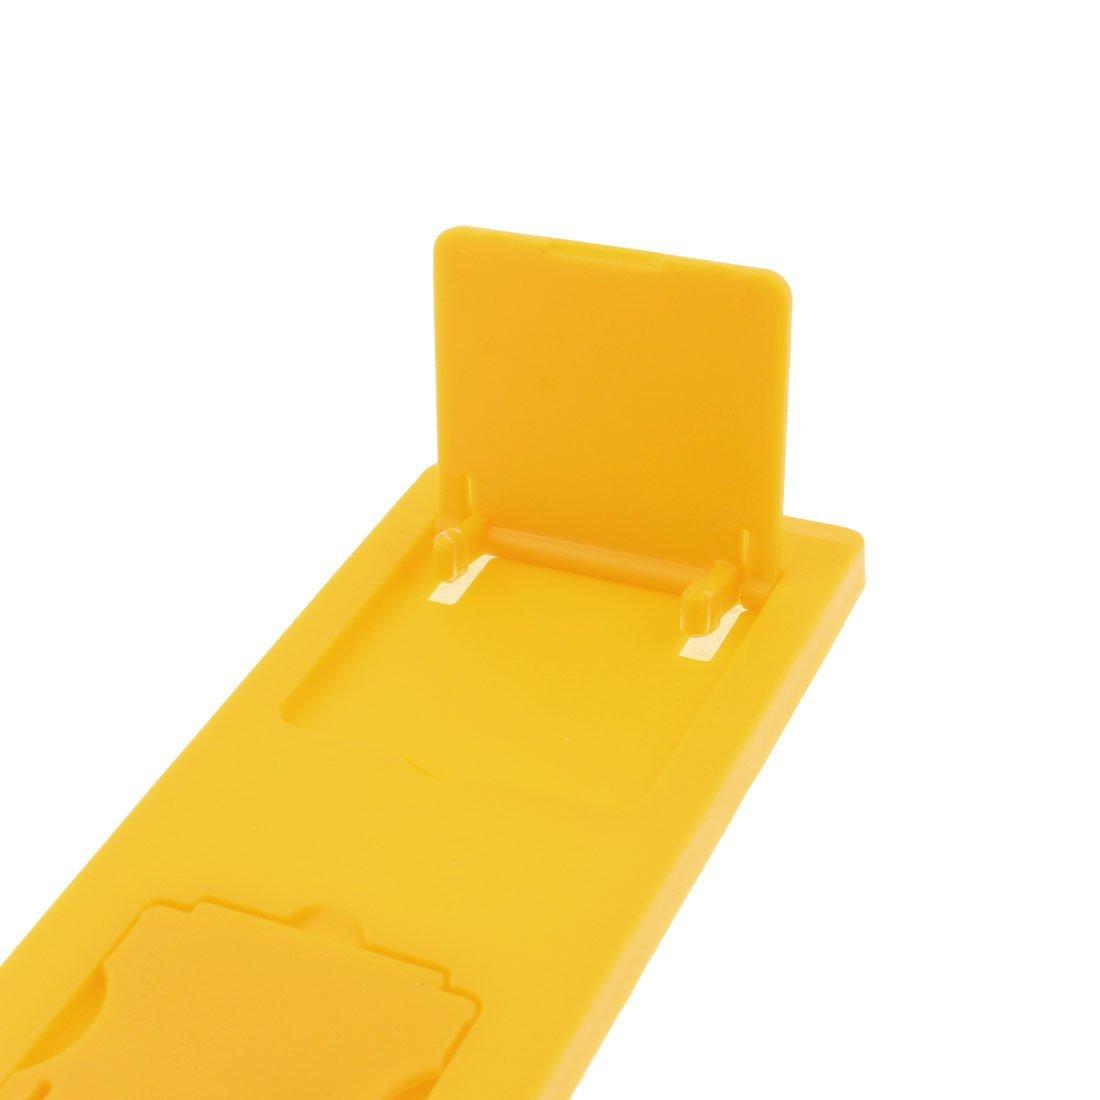 eDealMax a16010500ux2722 marco de plástico Teléfono móvil de la pantalla plegable Lupa base de color amarillo, - - Amazon.com